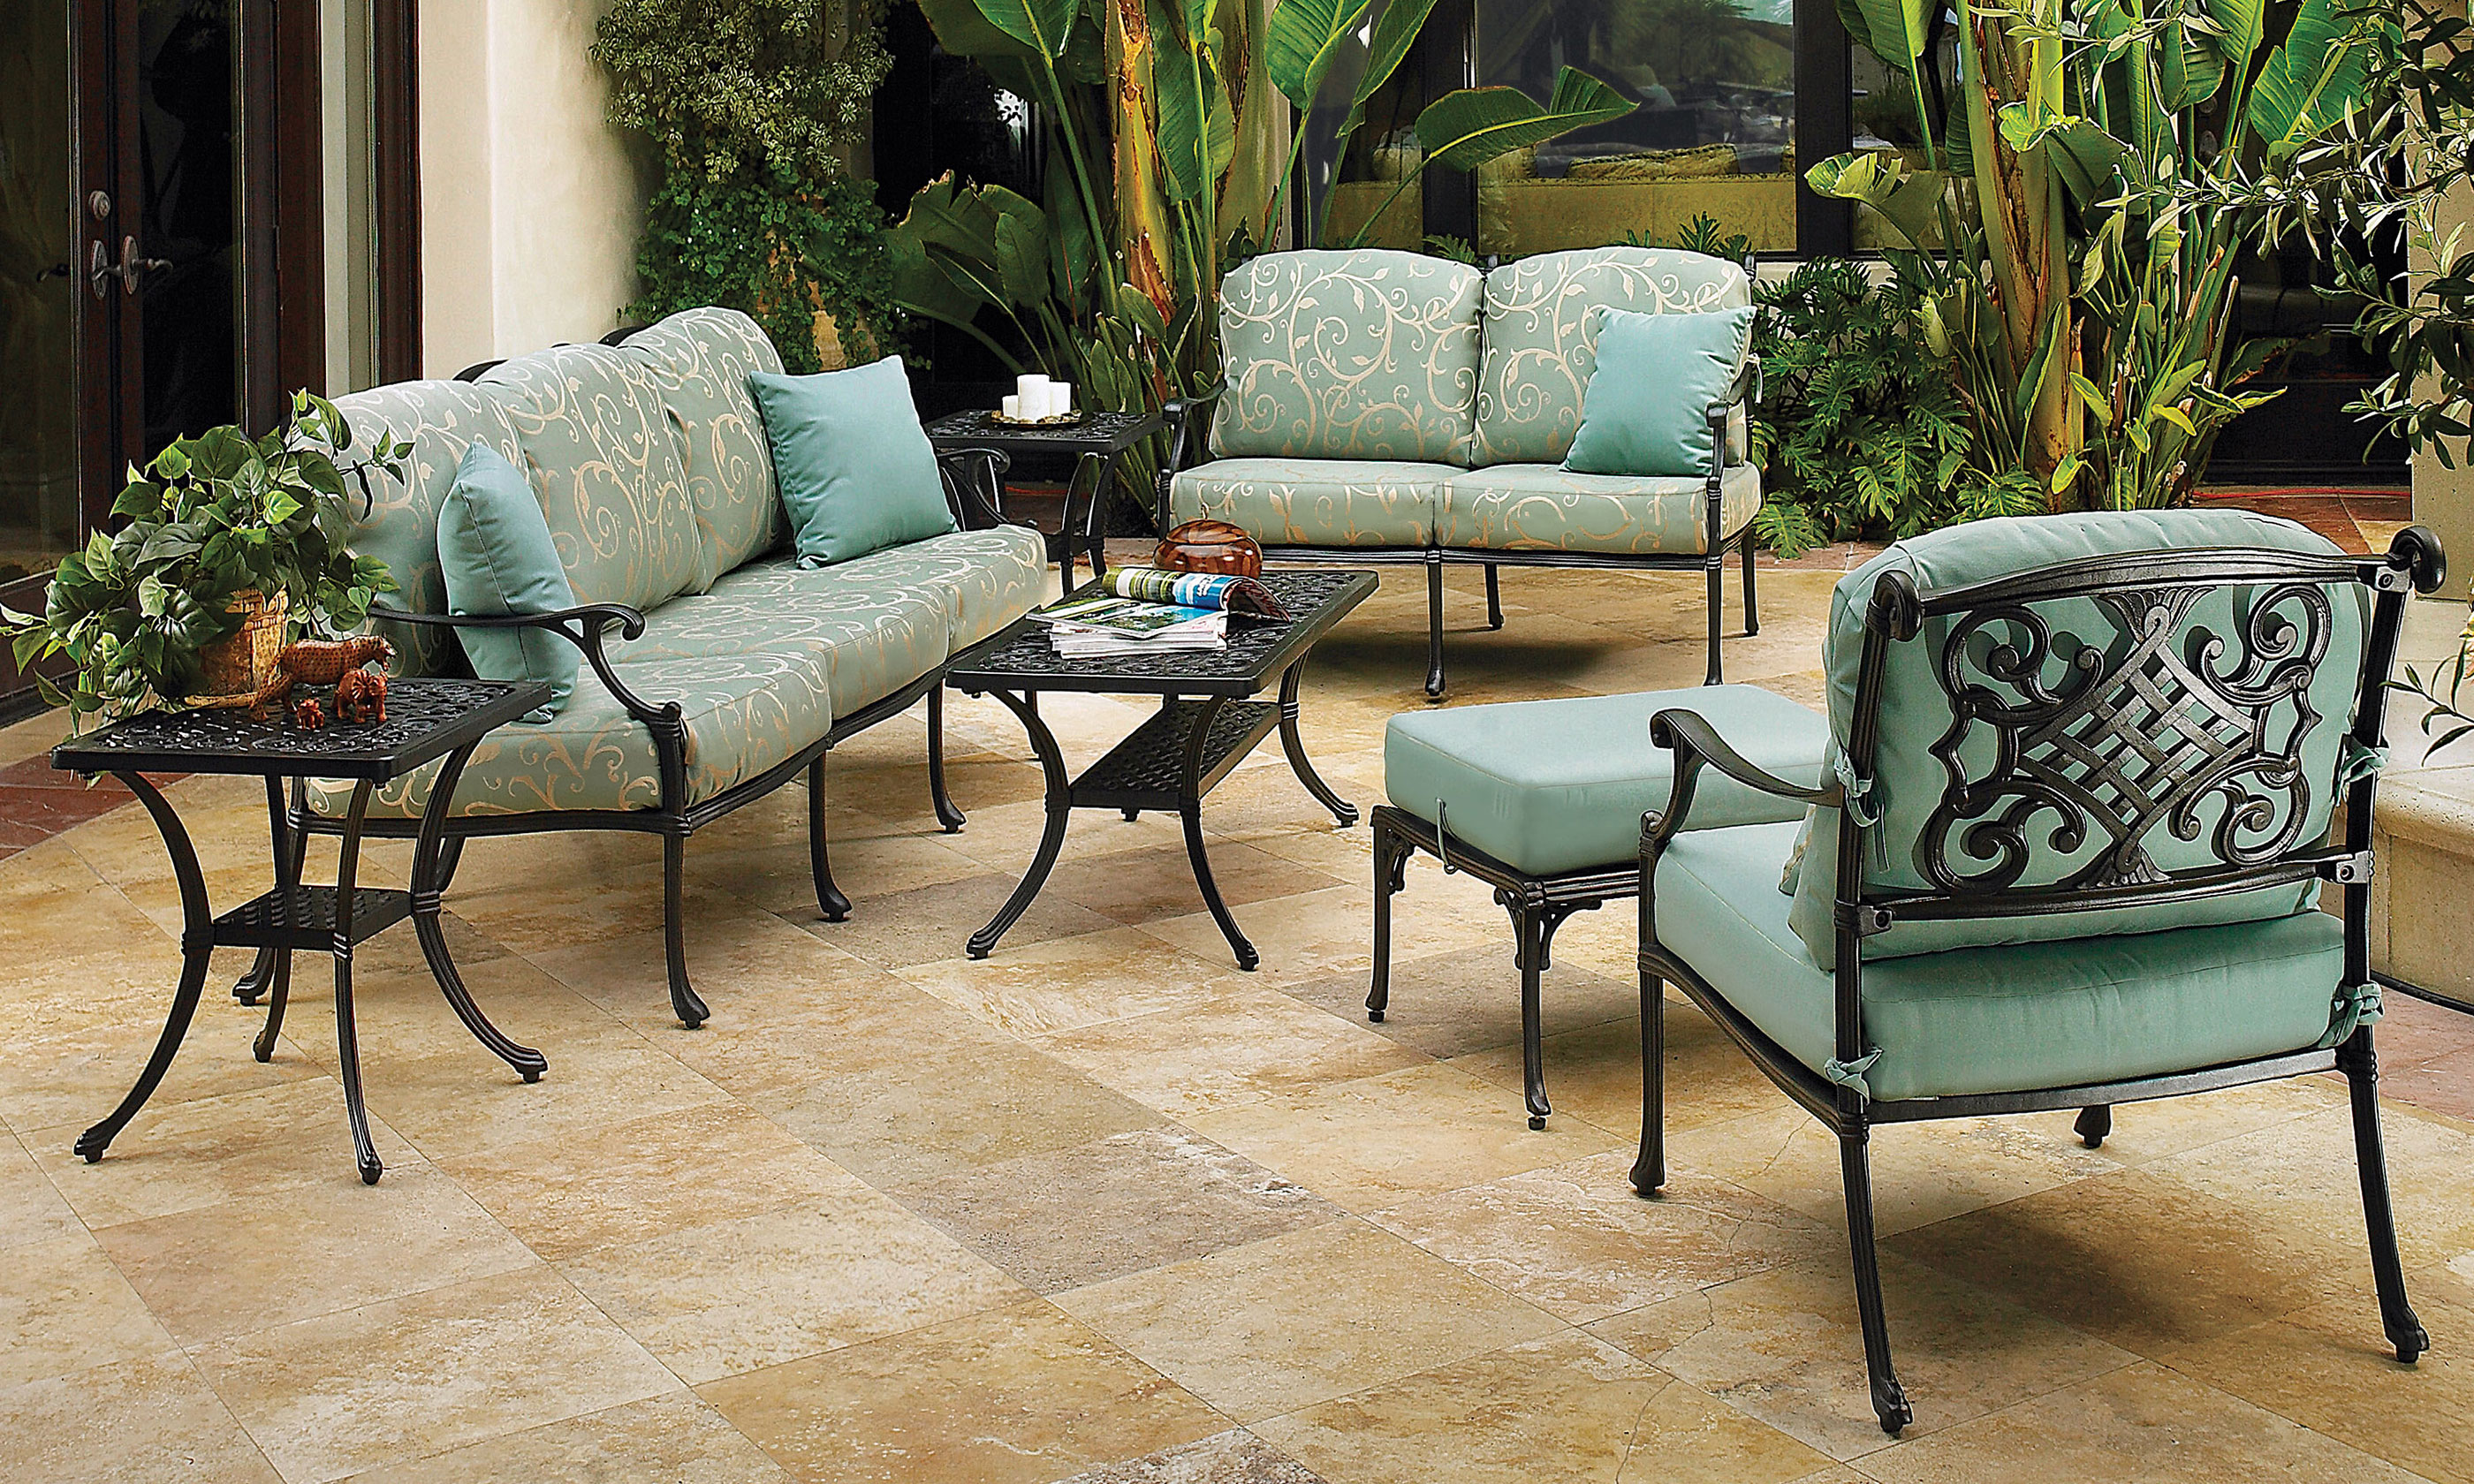 Outdoor Furniture > Furniture Collections > Michigan - Gensun